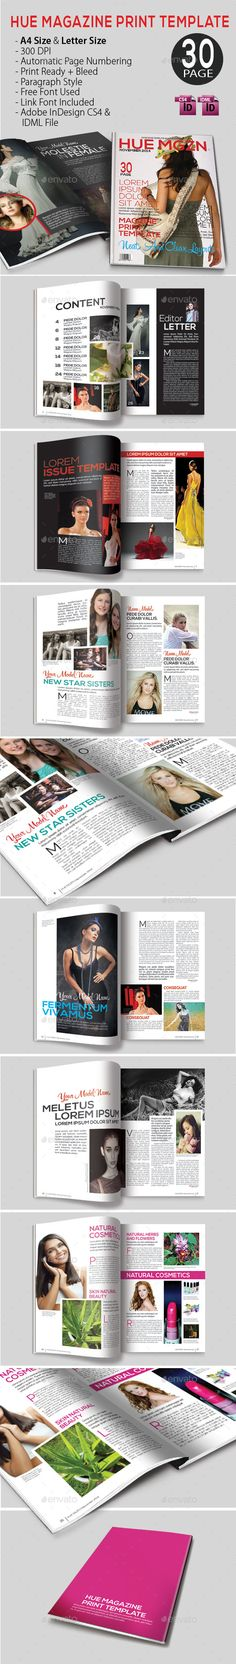 Hue Magazine Template | #magazinetemplate | Download: http://graphicriver.net/item/hue-magazine-template/9630841?ref=ksioks